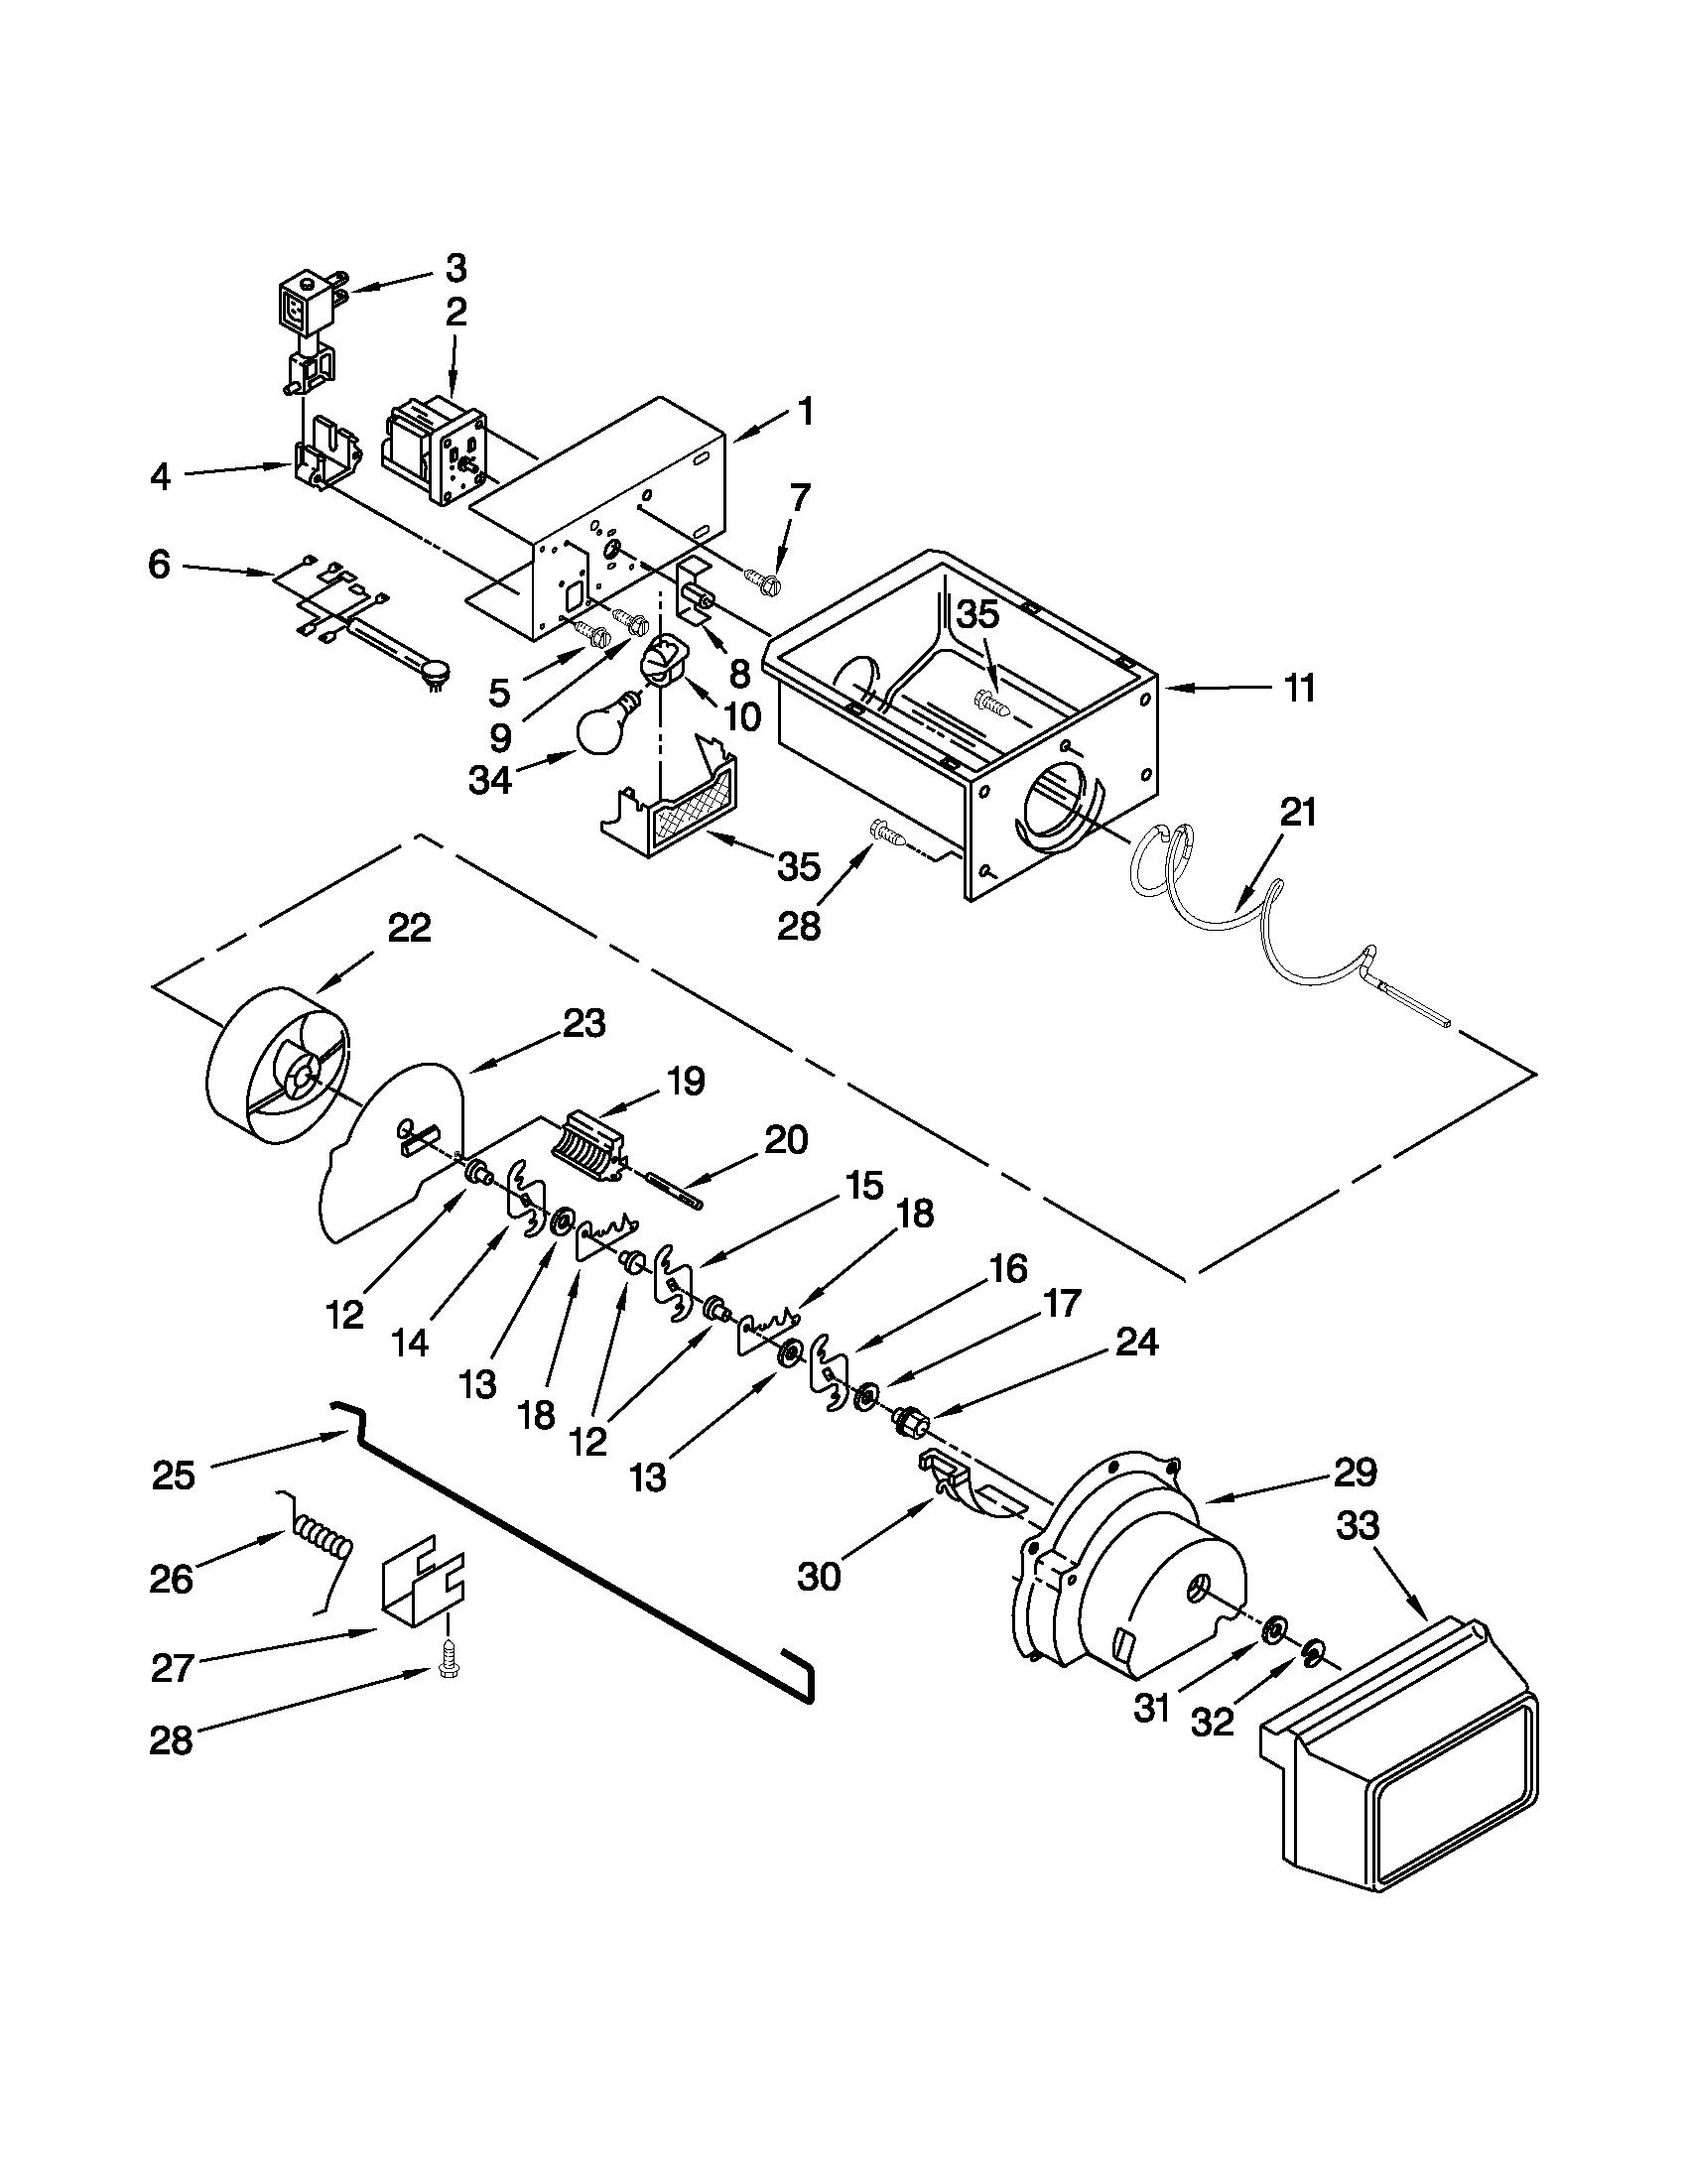 Opel Astra H Wiring Diagram Pdf